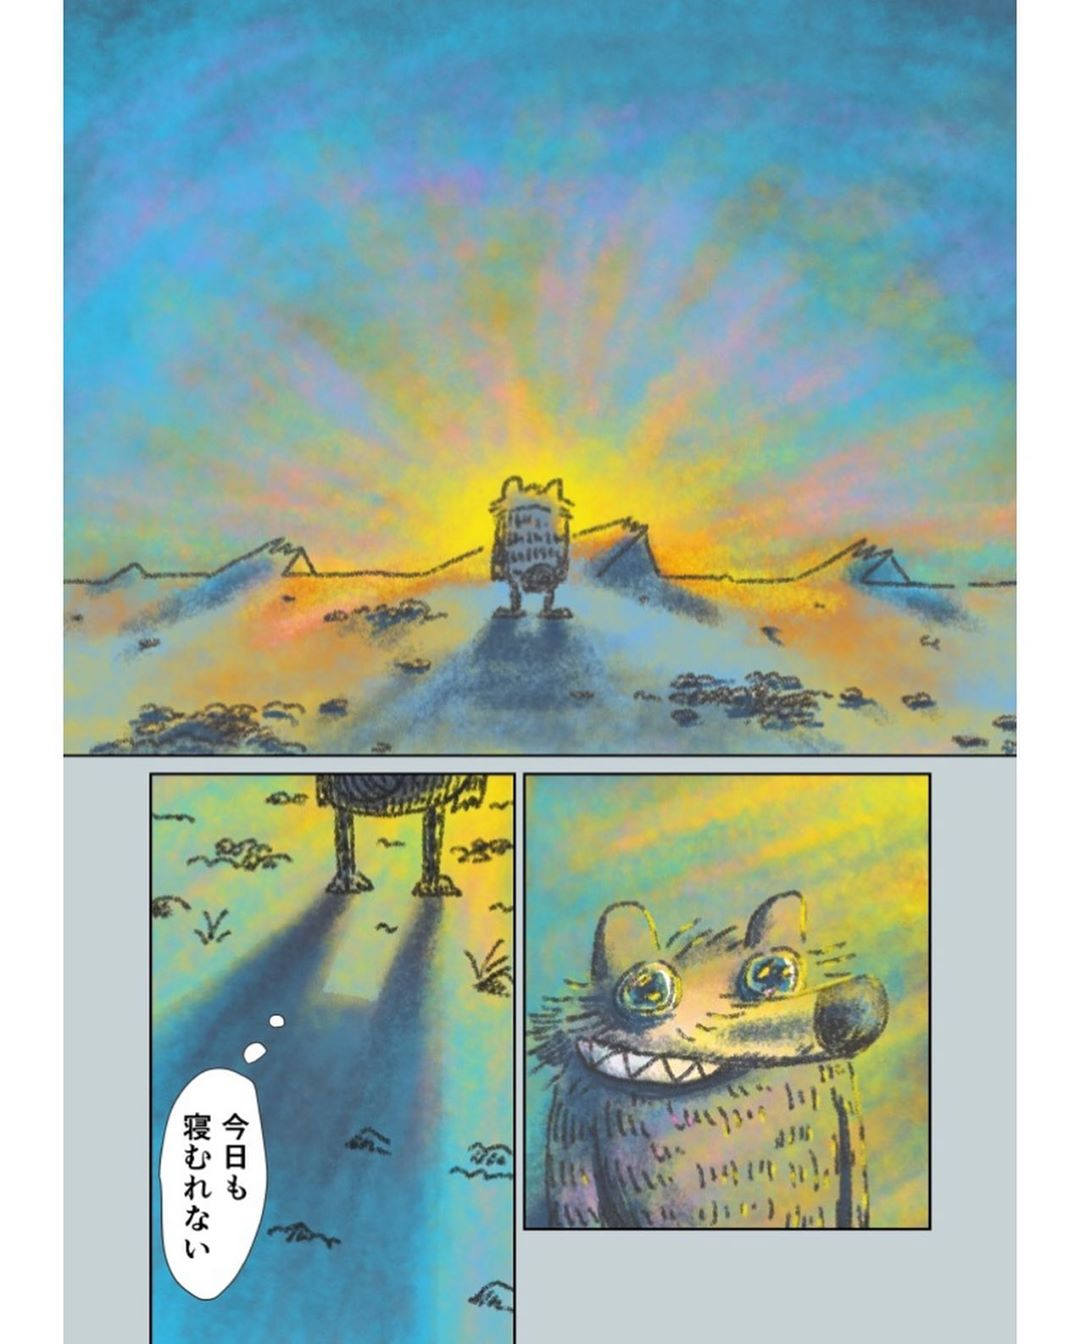 shitara_ryo_tacorice88_73713643_899236517136937_2502737276519937819_n